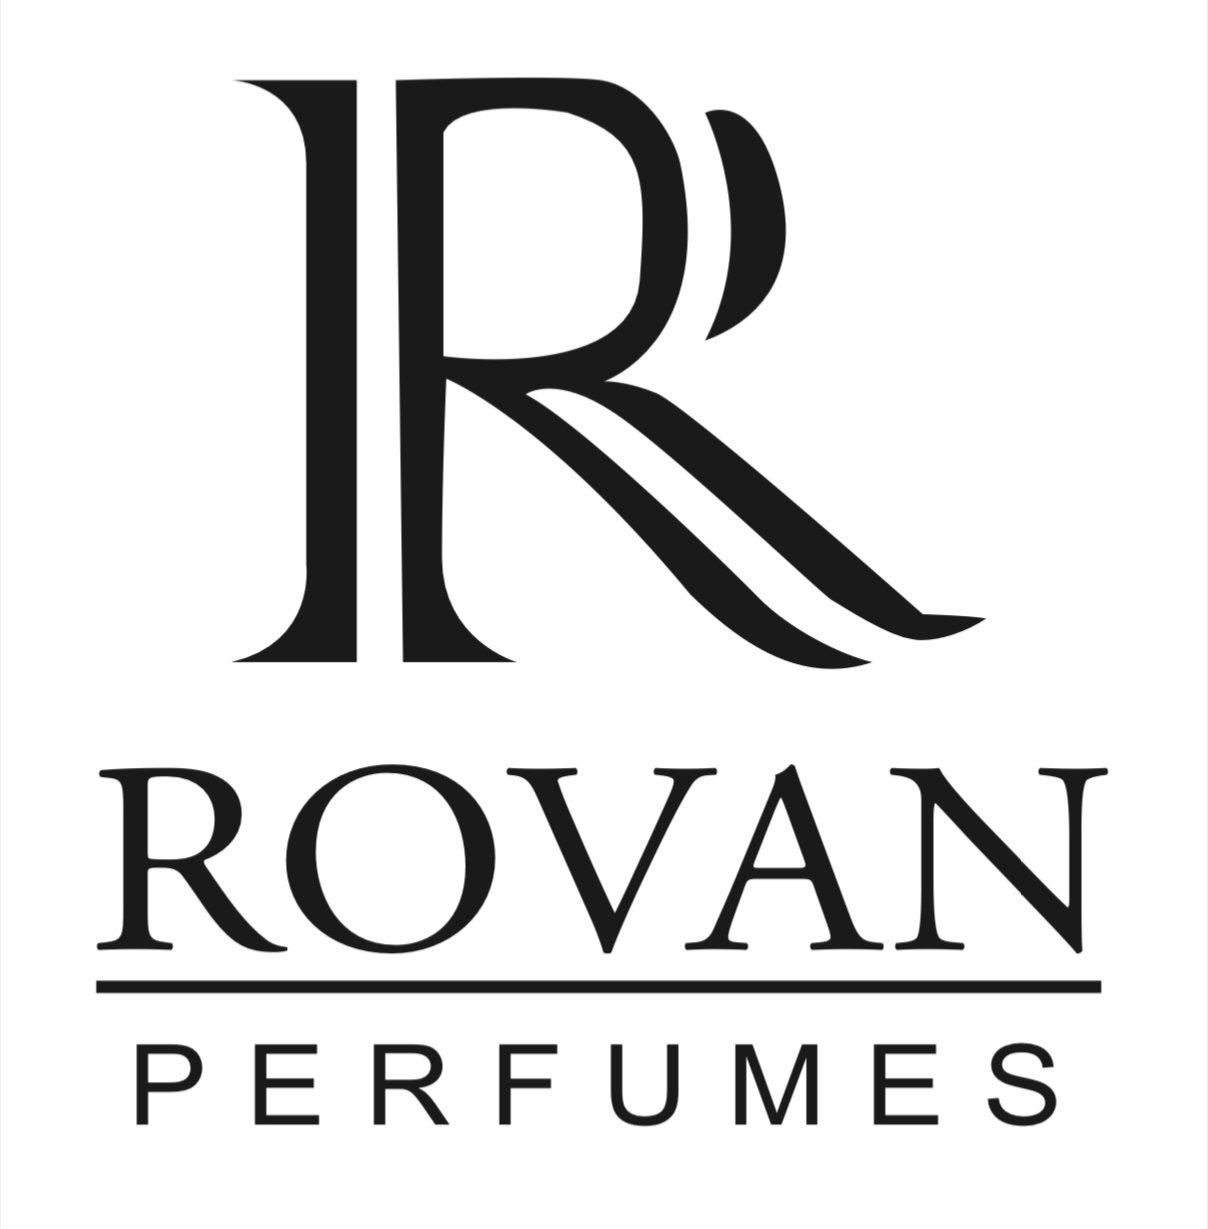 Rovan performs